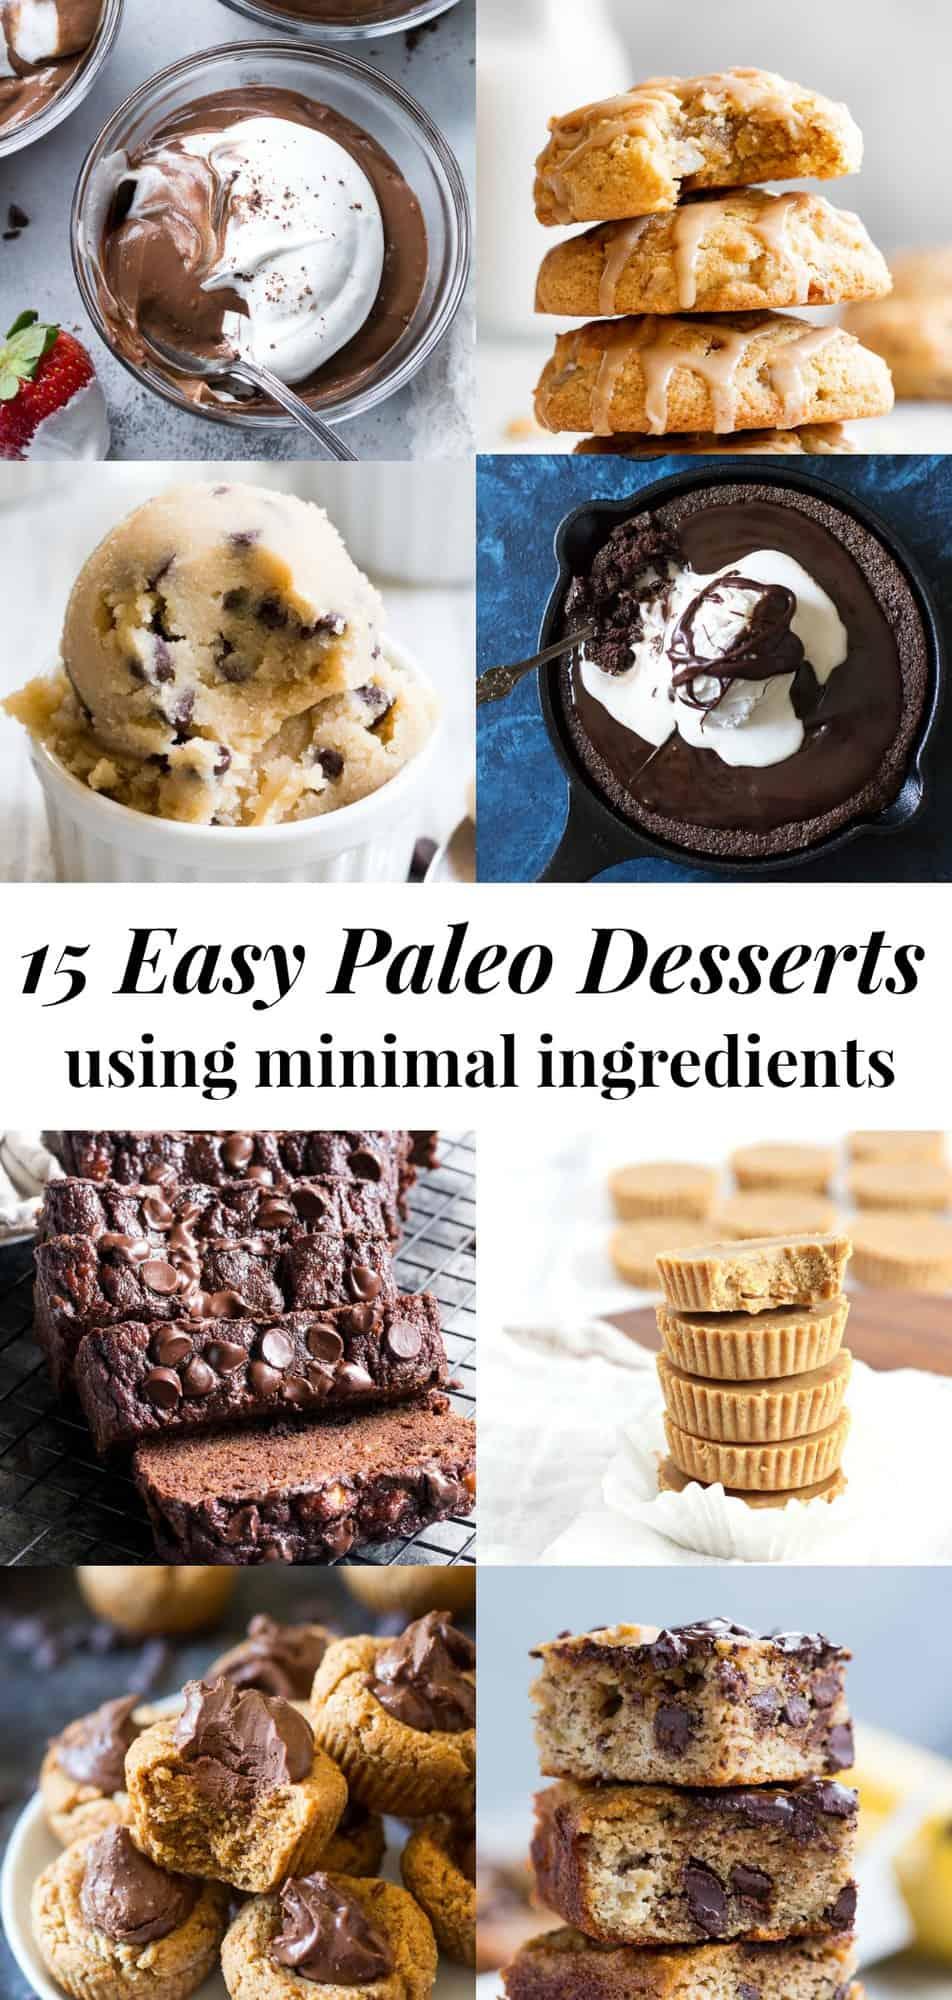 15 Easy Paleo Desserts With Minimal Ingredients